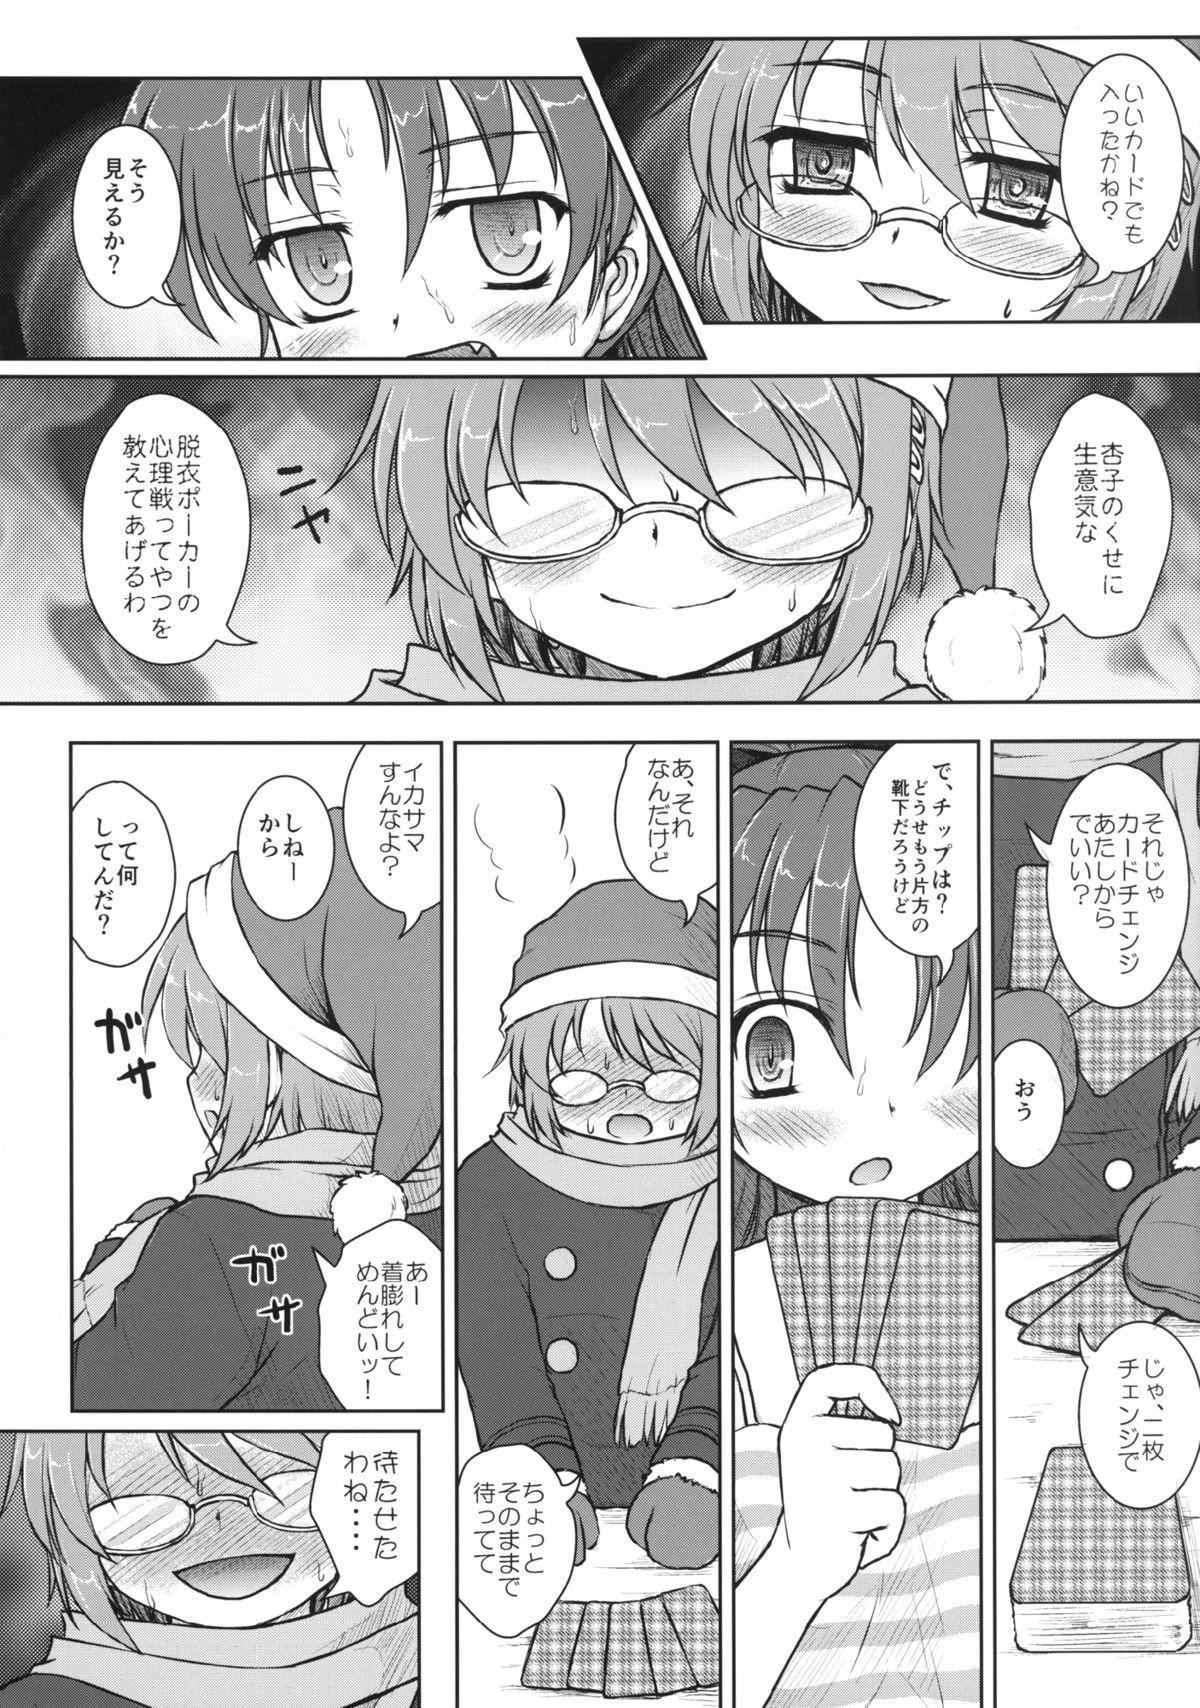 (SHT2013 Haru) [Newtype Kenkyuujo (Kotowari)] Sayaka-san to Kyouko-san (Puella Magi Madoka Magica) 10